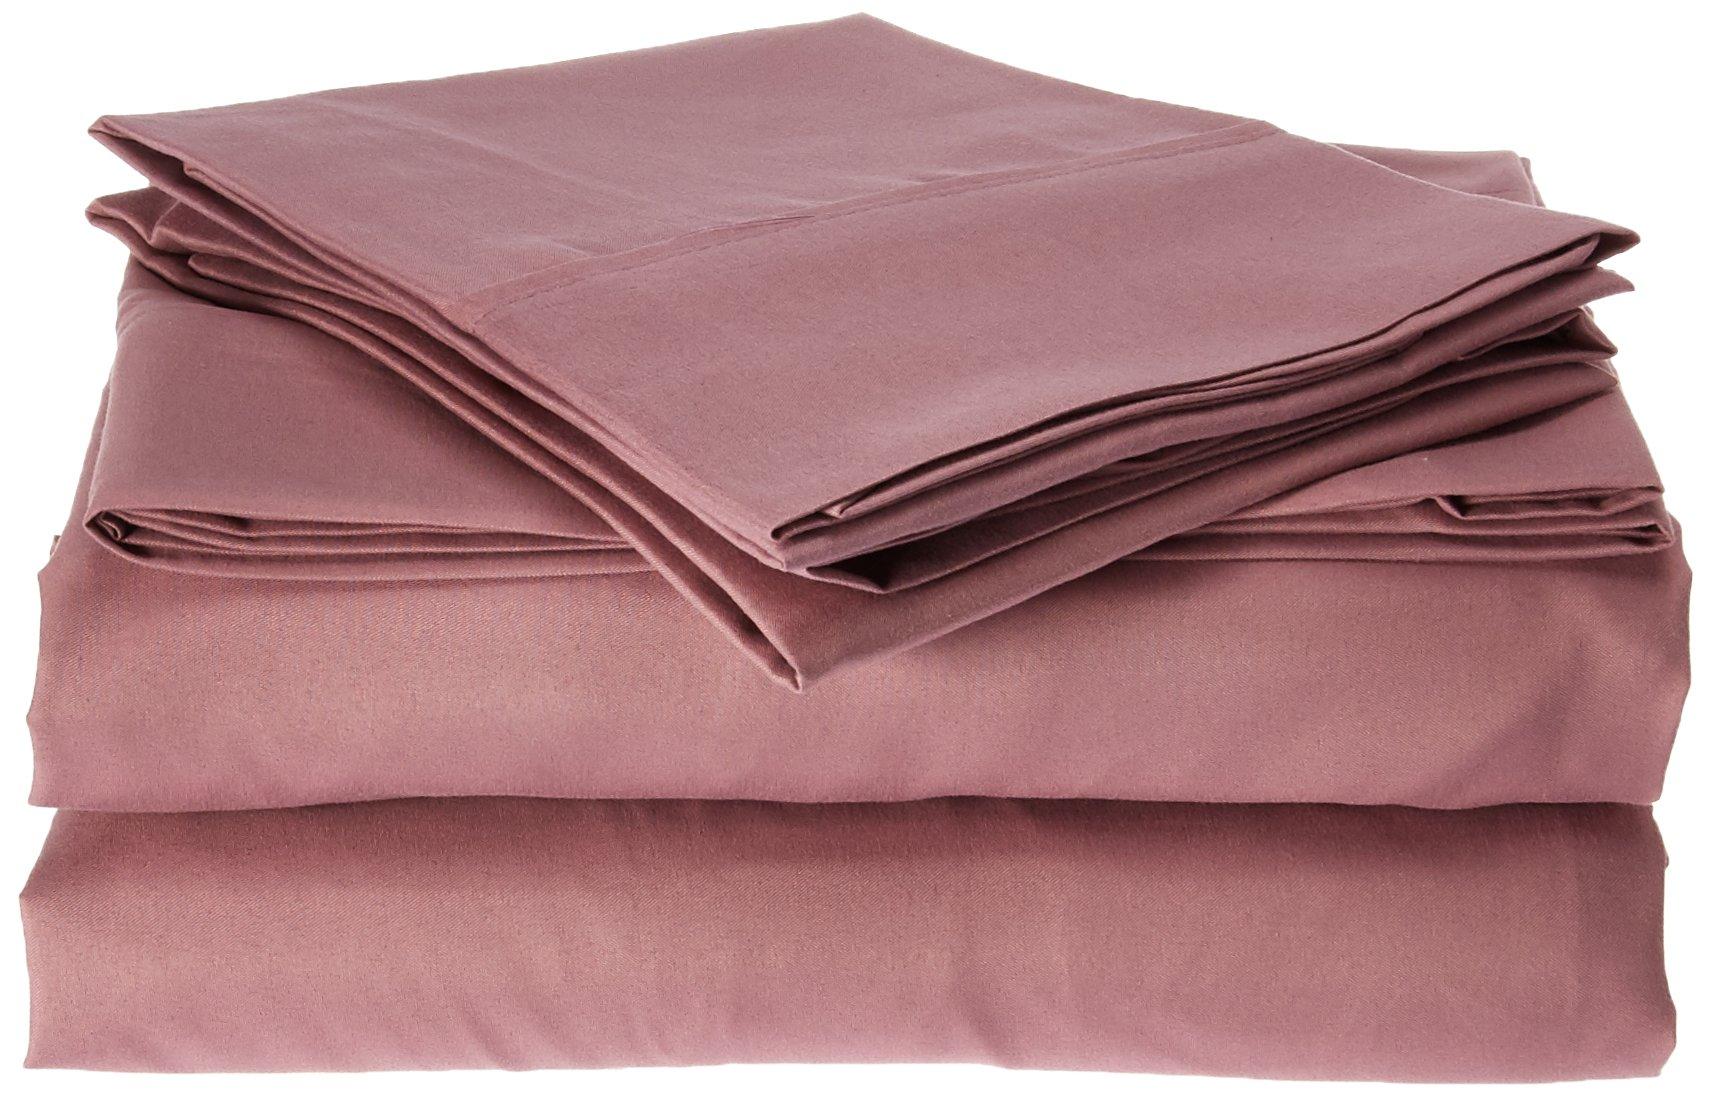 Spirit Linen, Inc Hotel 5th Ave EE-FULL-ROSE-4PC Full Rose Everyday Essentials 1800 Series 4Pc Sheet Set